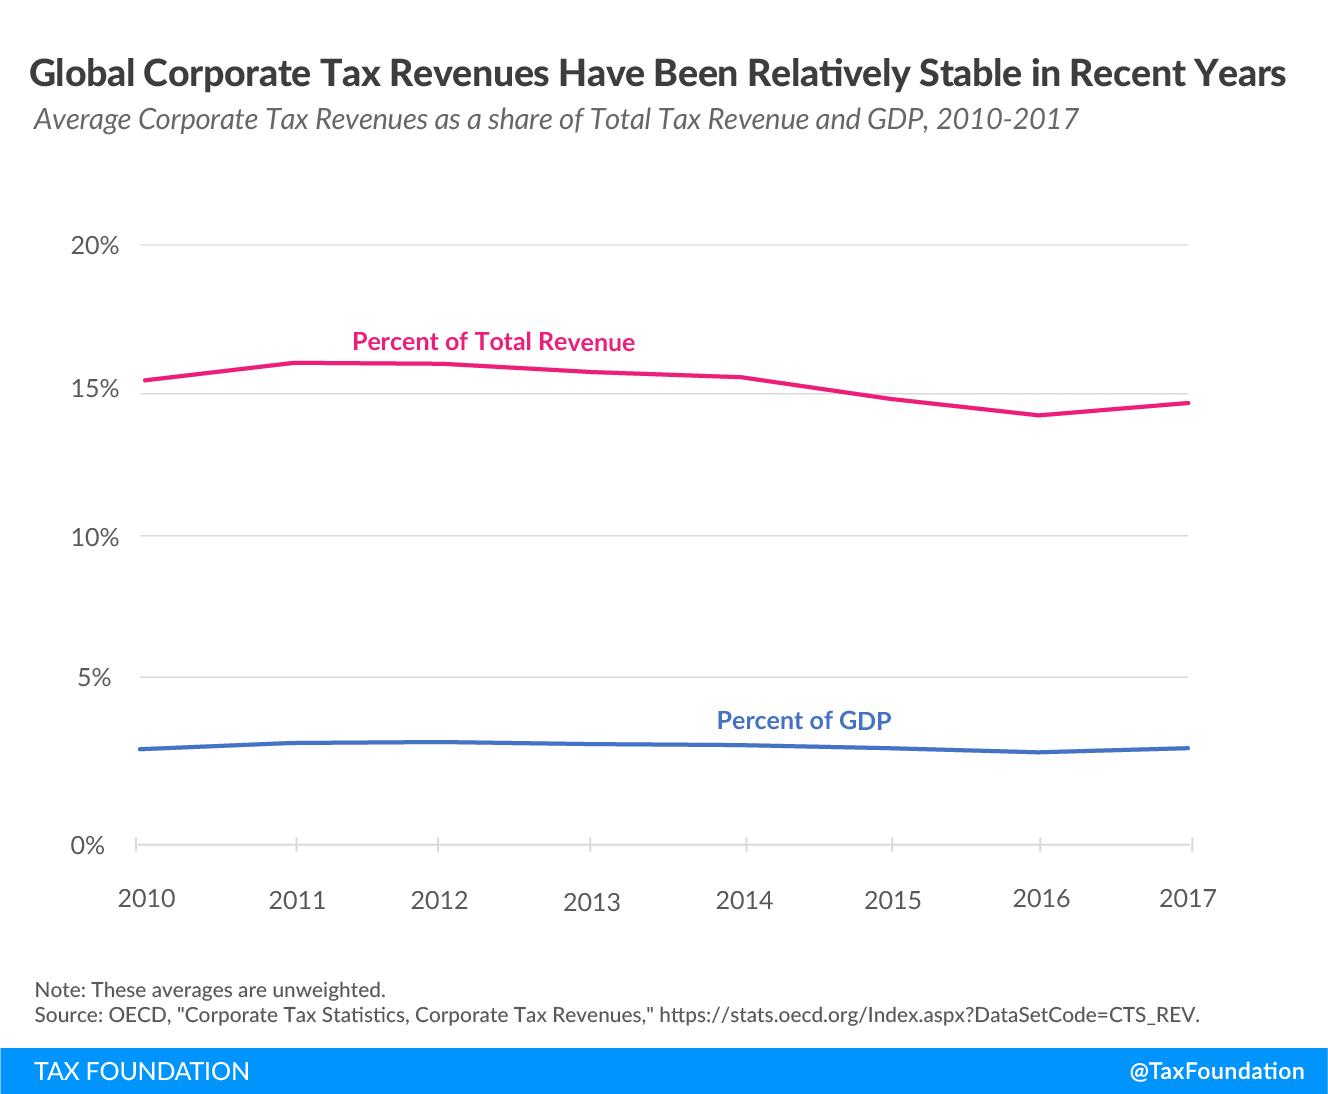 trends in corporate revenues, corporate tax trends, global minimum tax, minimum taxes, tax conflict